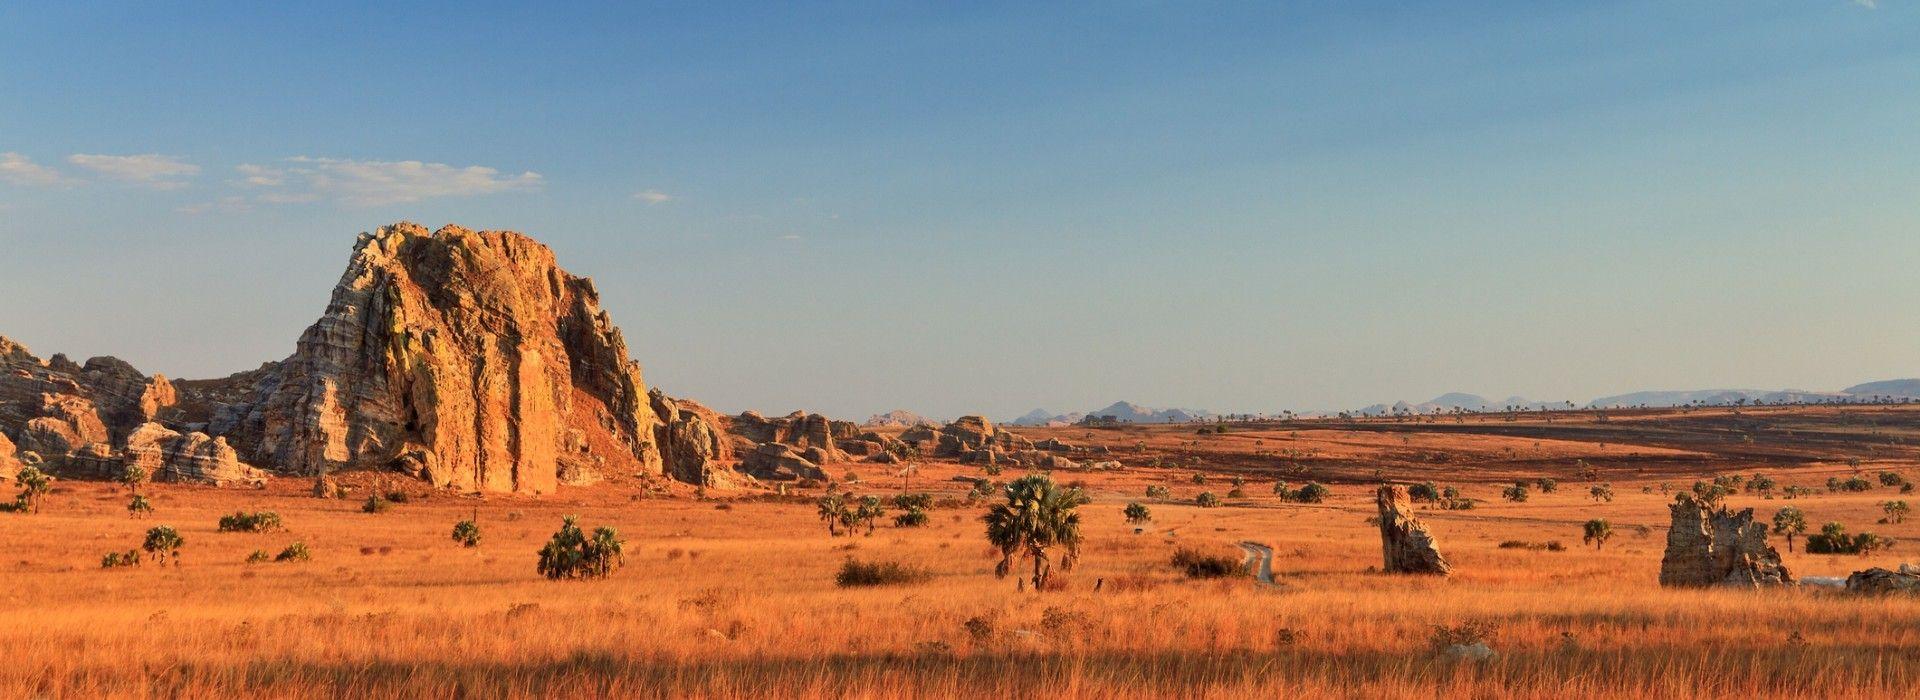 Madagascar Tours and Trips to Madagascar